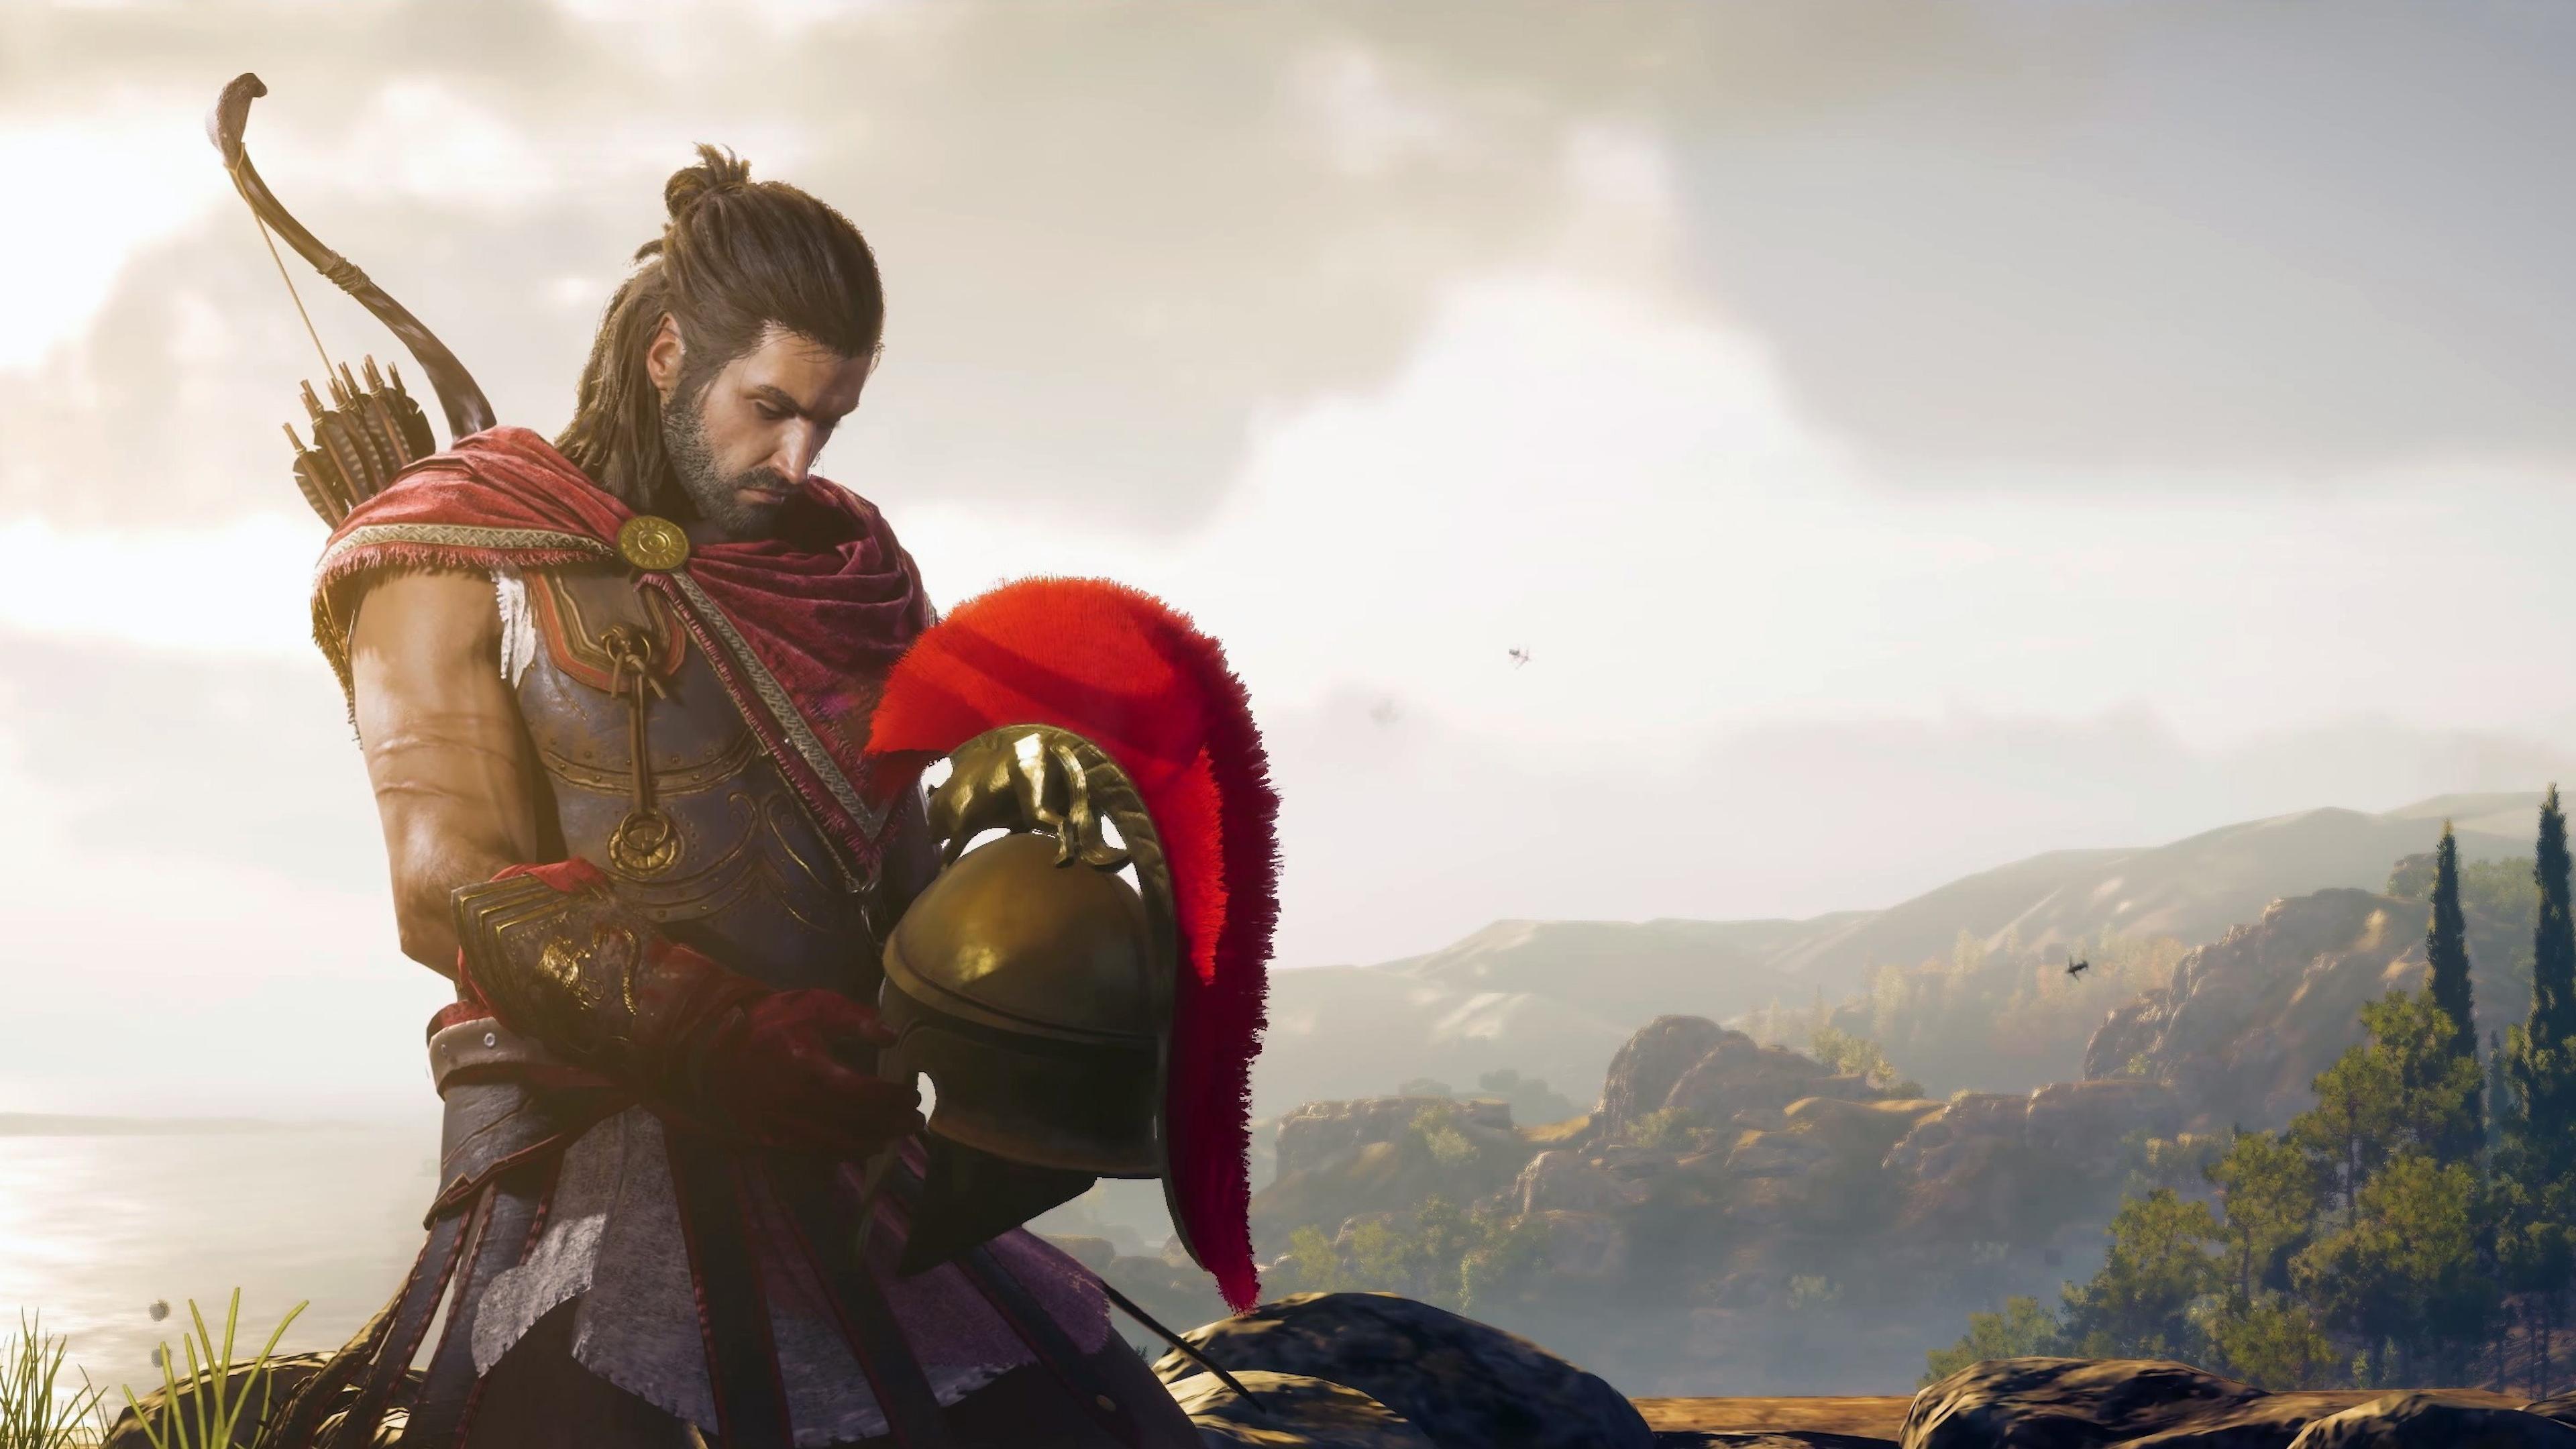 Assassins Creed 2 Hd Wallpapers Assassin S Creed Odyssey 4k 8k Hd Wallpaper 3